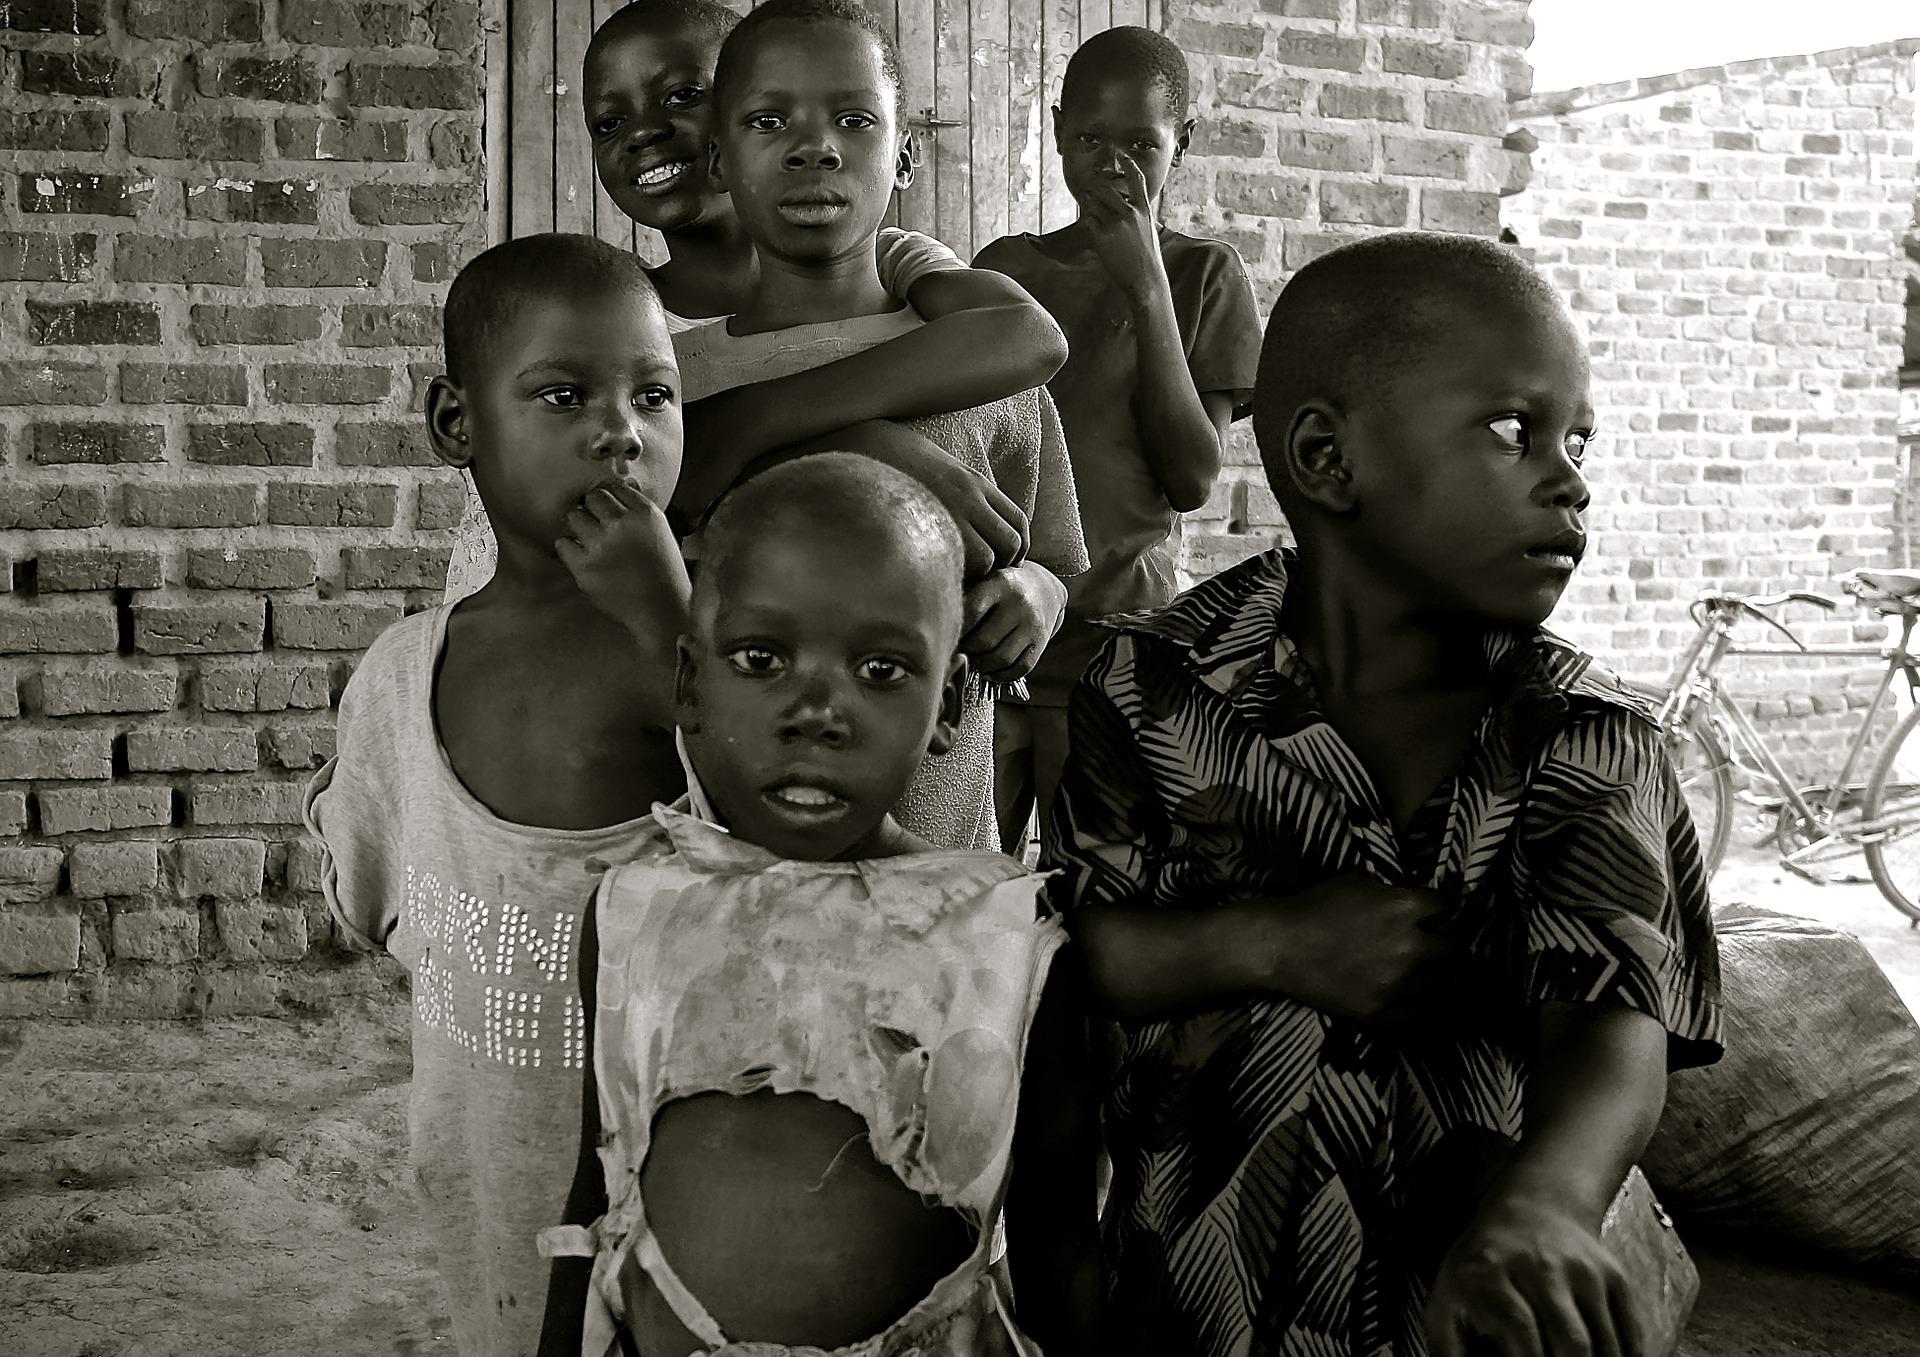 African children, ludi via Wikimedia commons